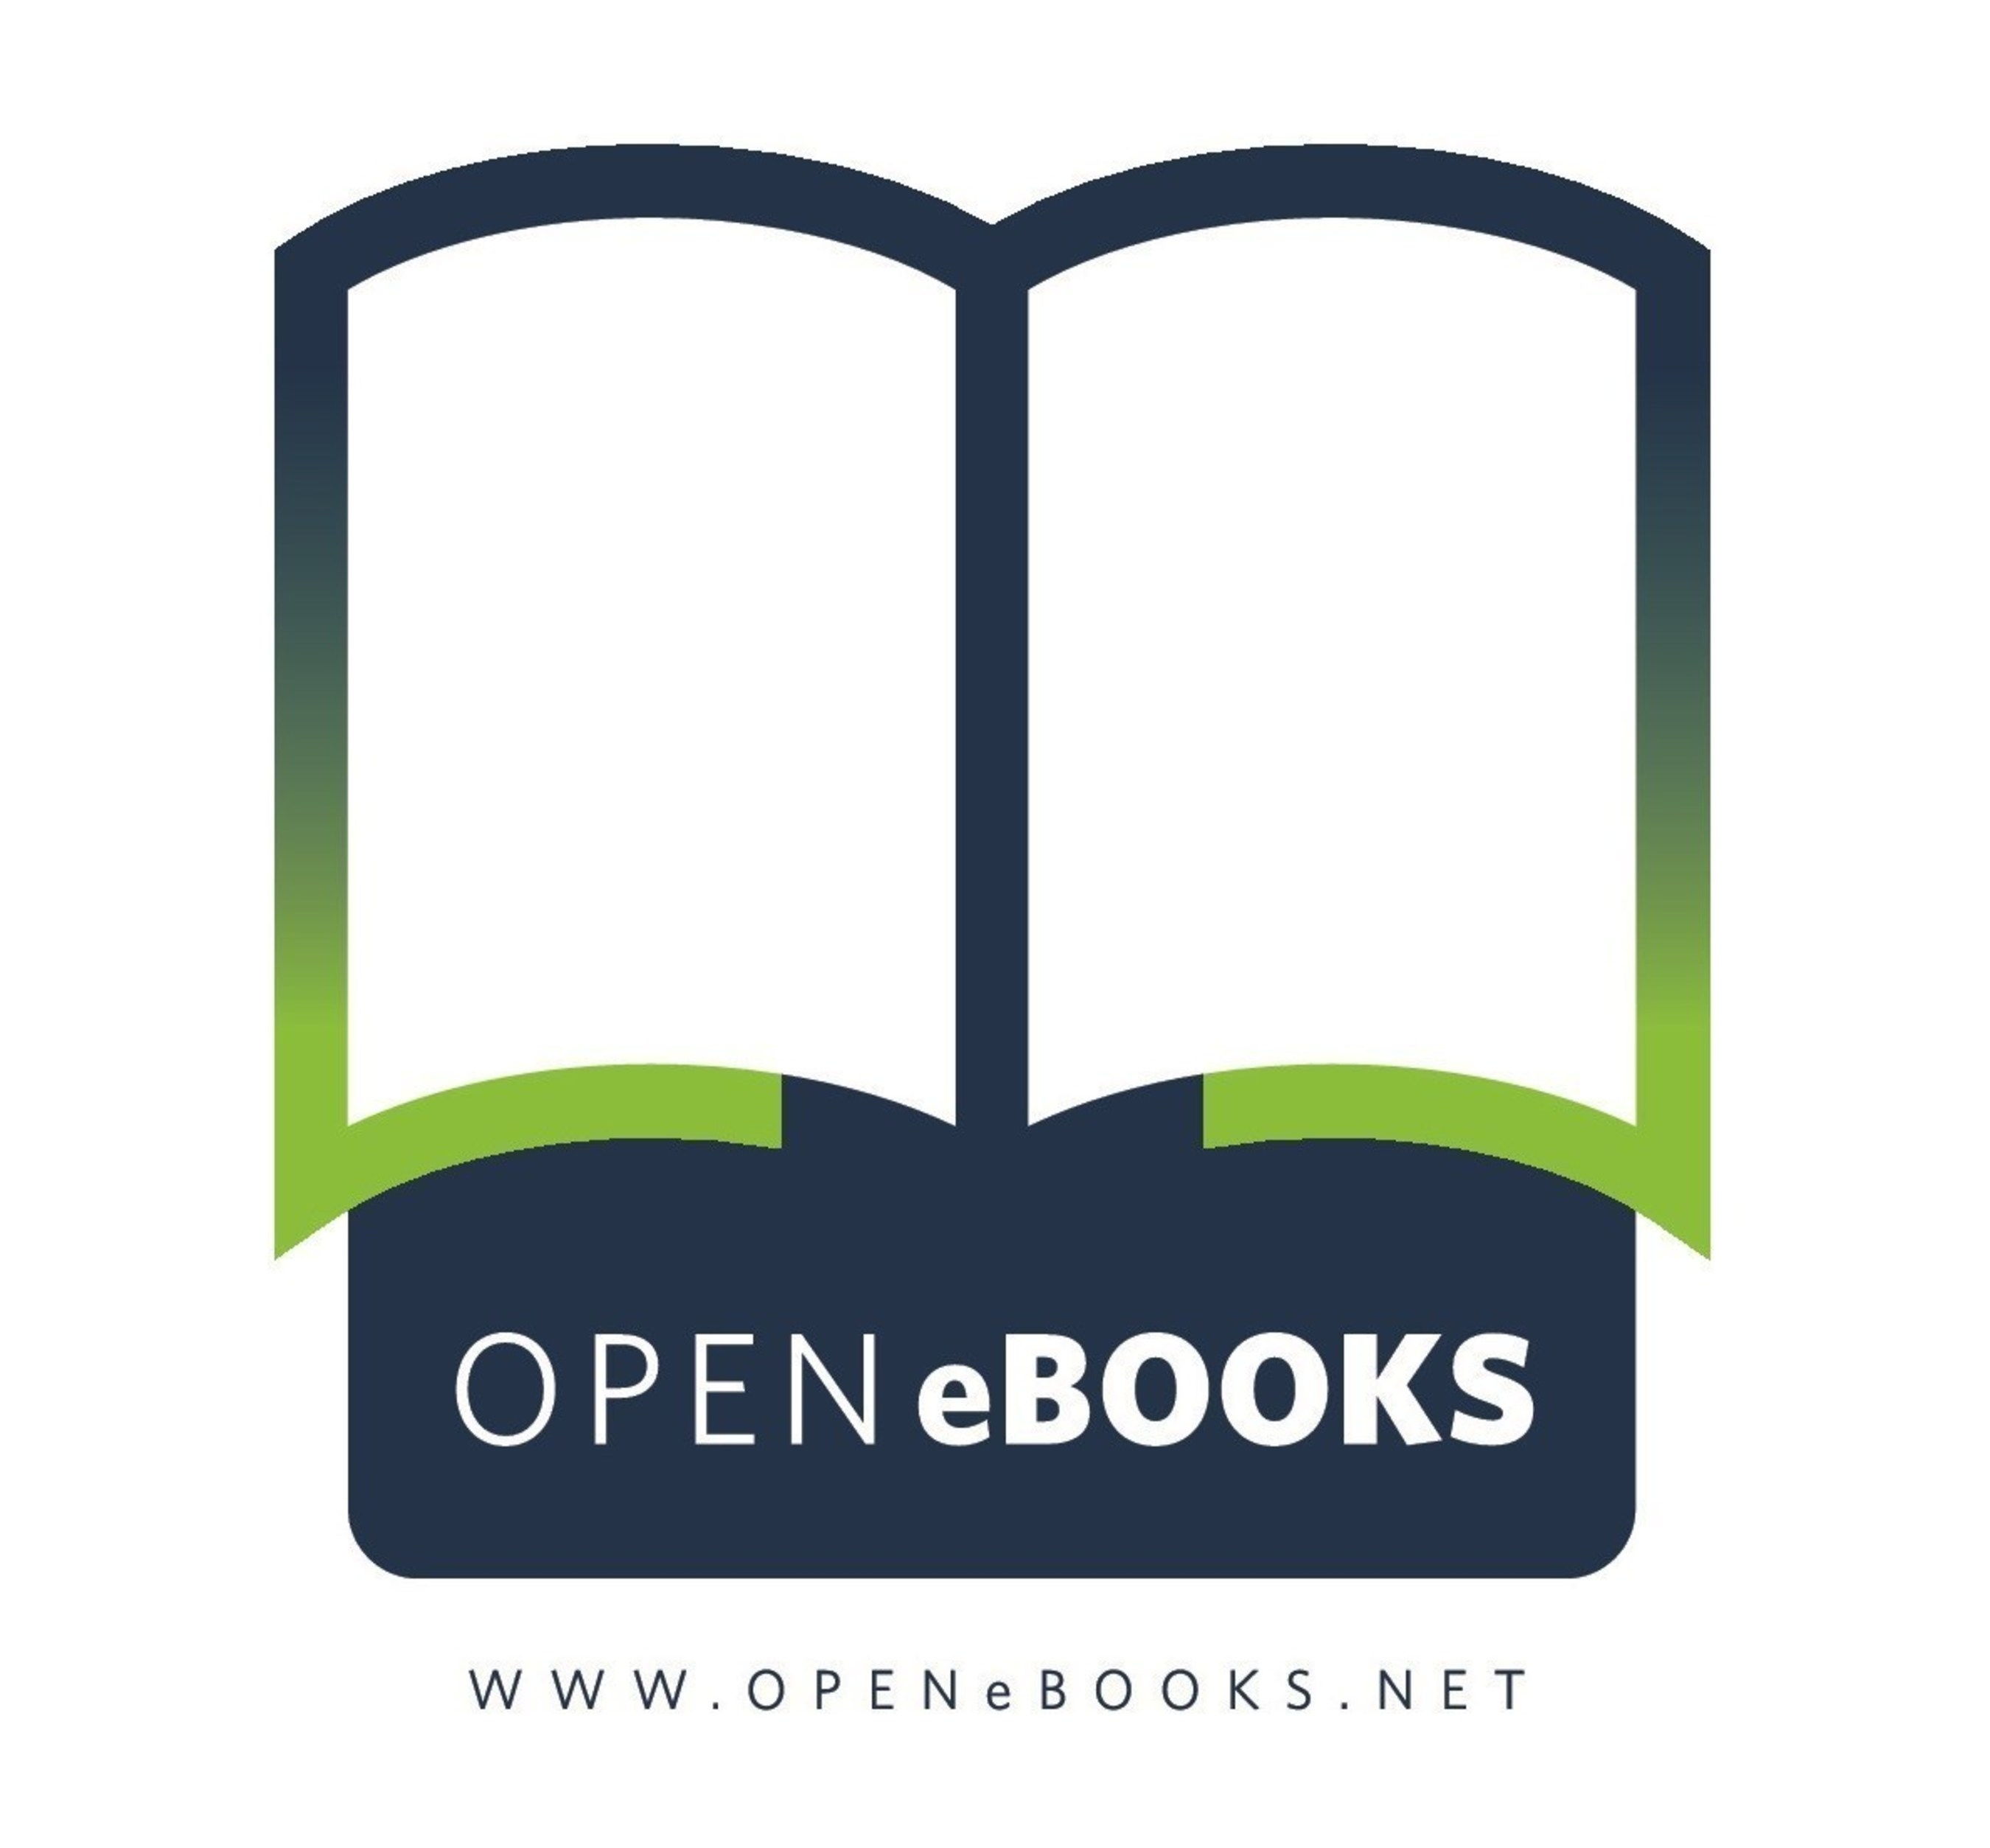 Open Ebooks Opens World Of Digital Reading To Children